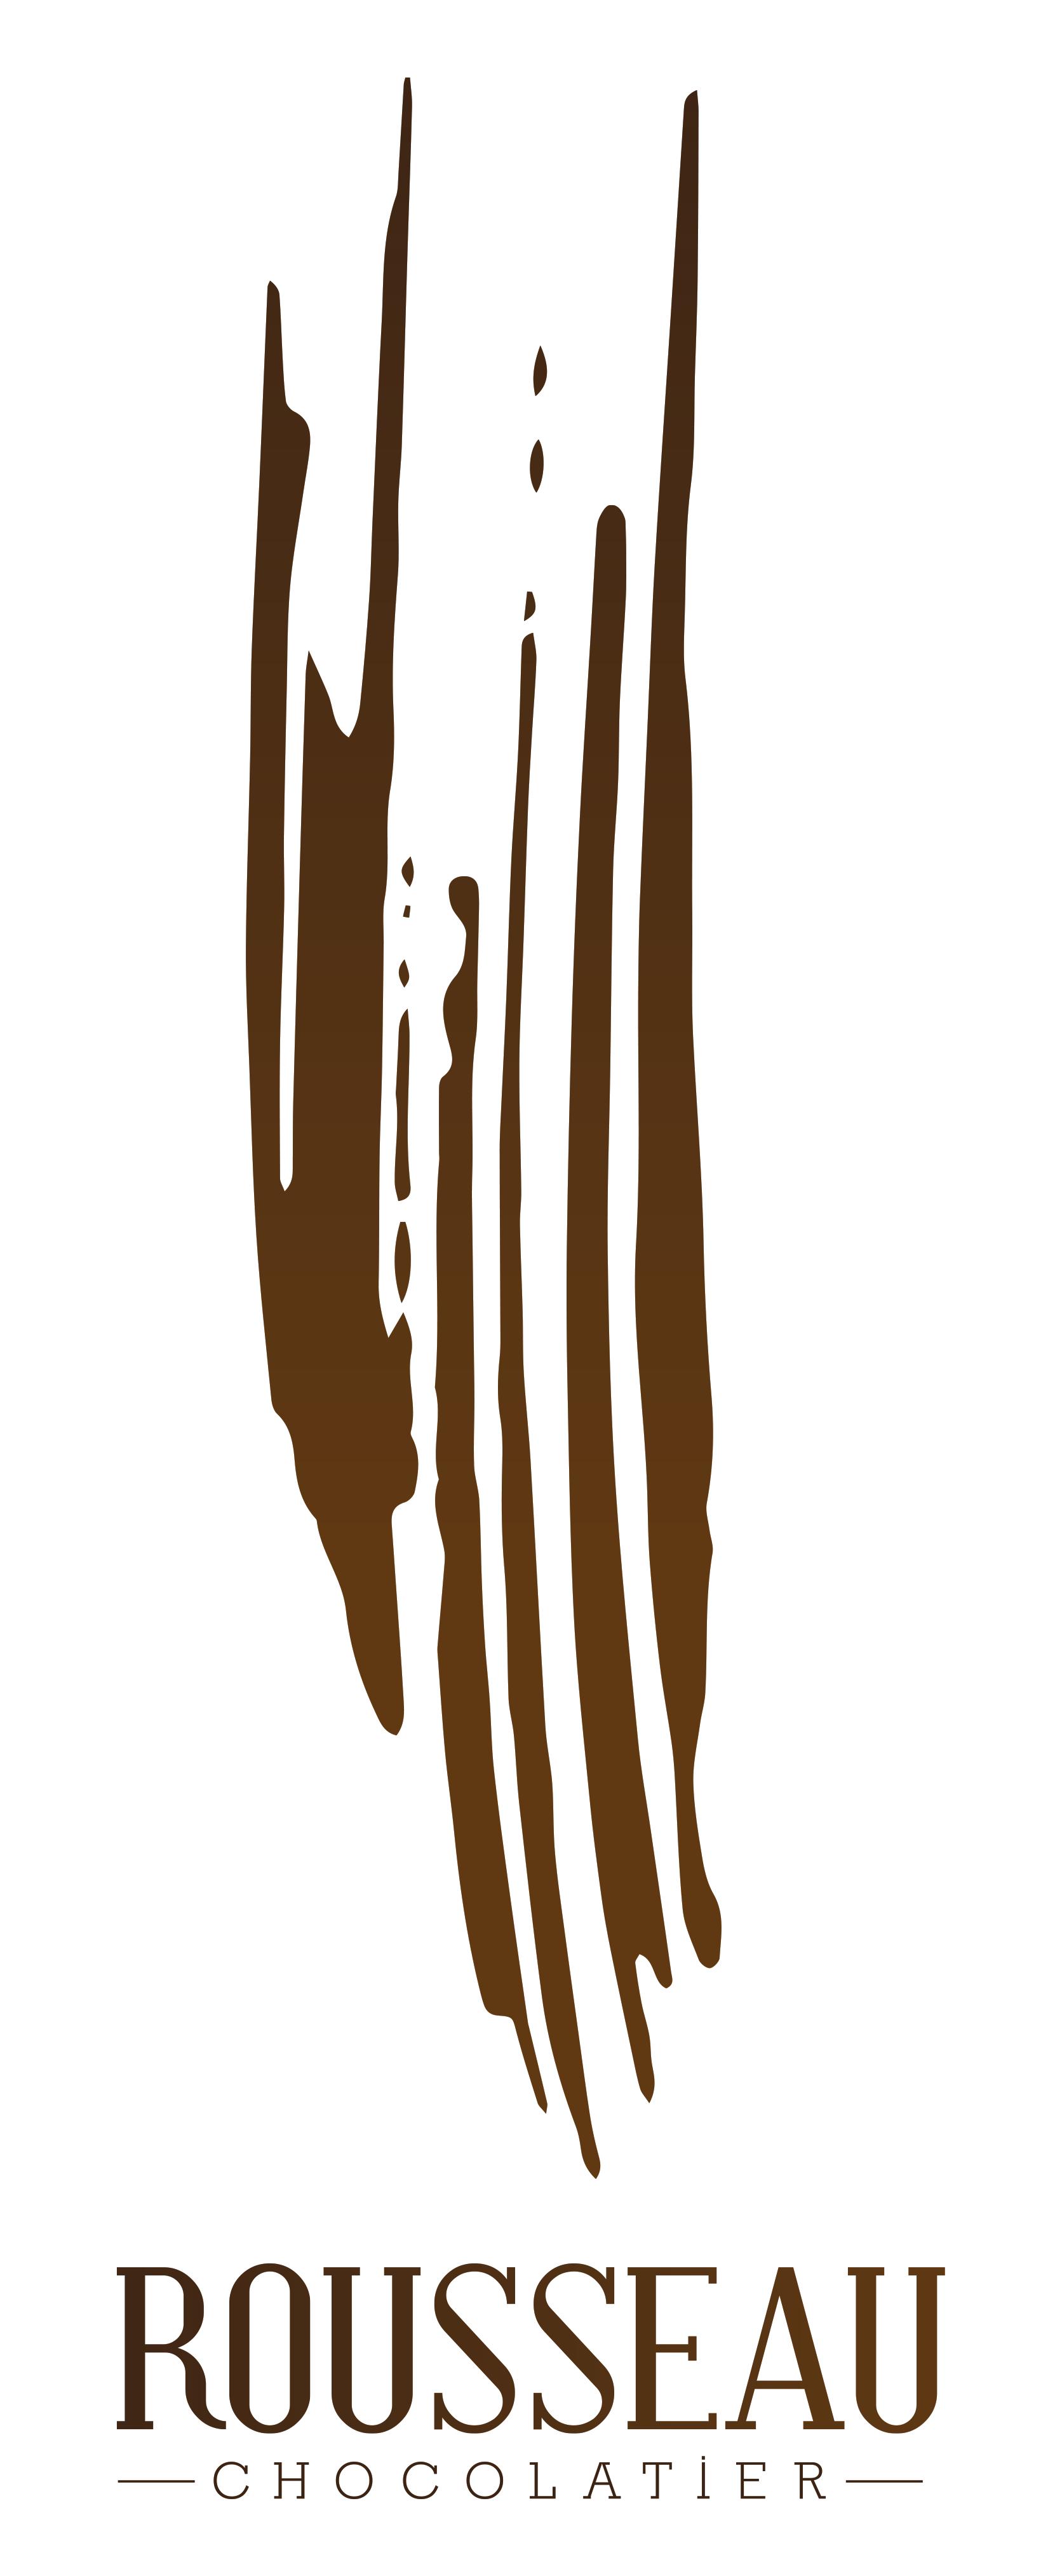 Rousseau Chocolatier